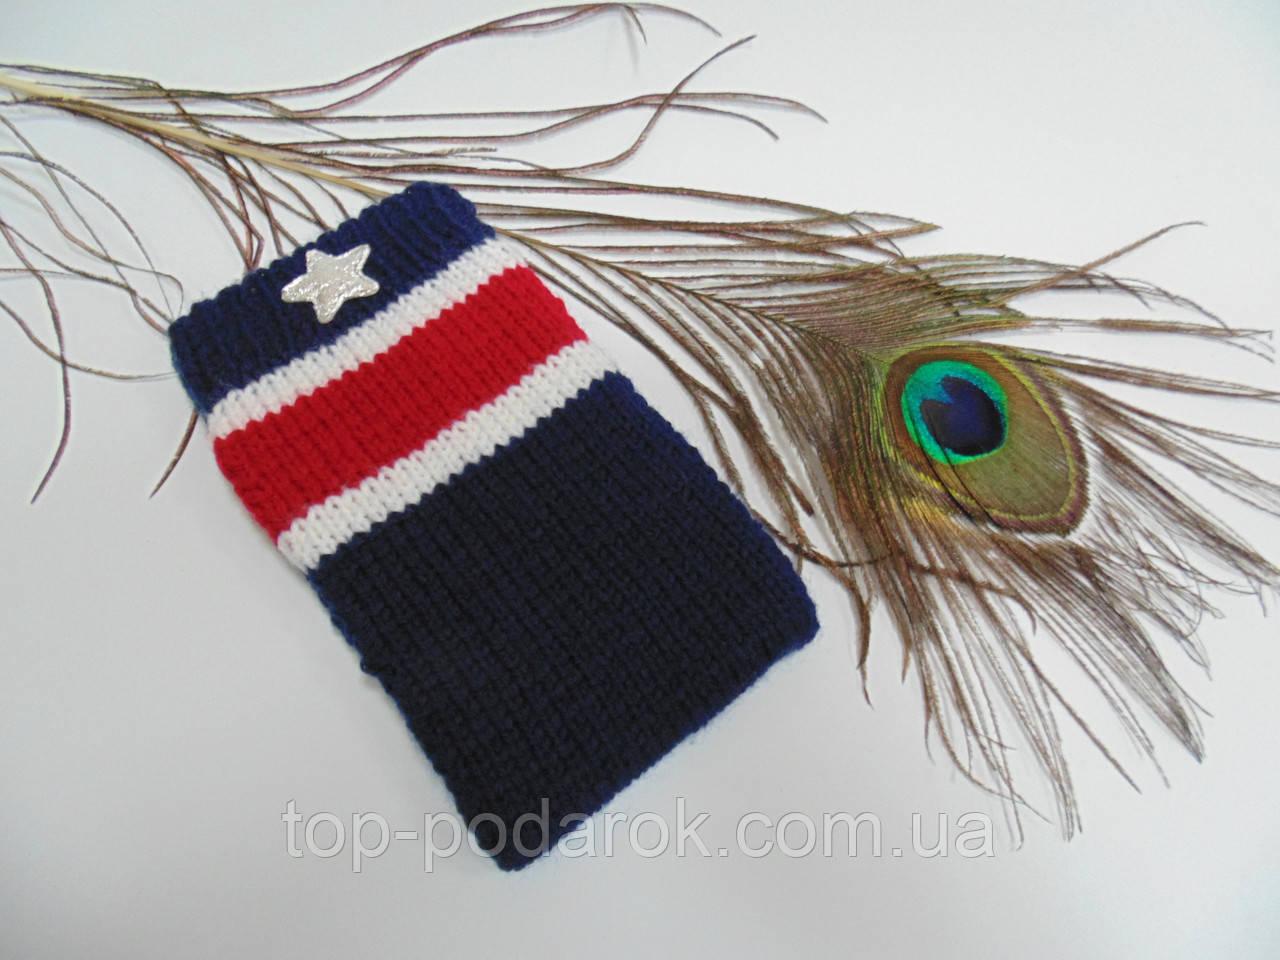 Вязанный чехол для iPhone,чехол для смартфона